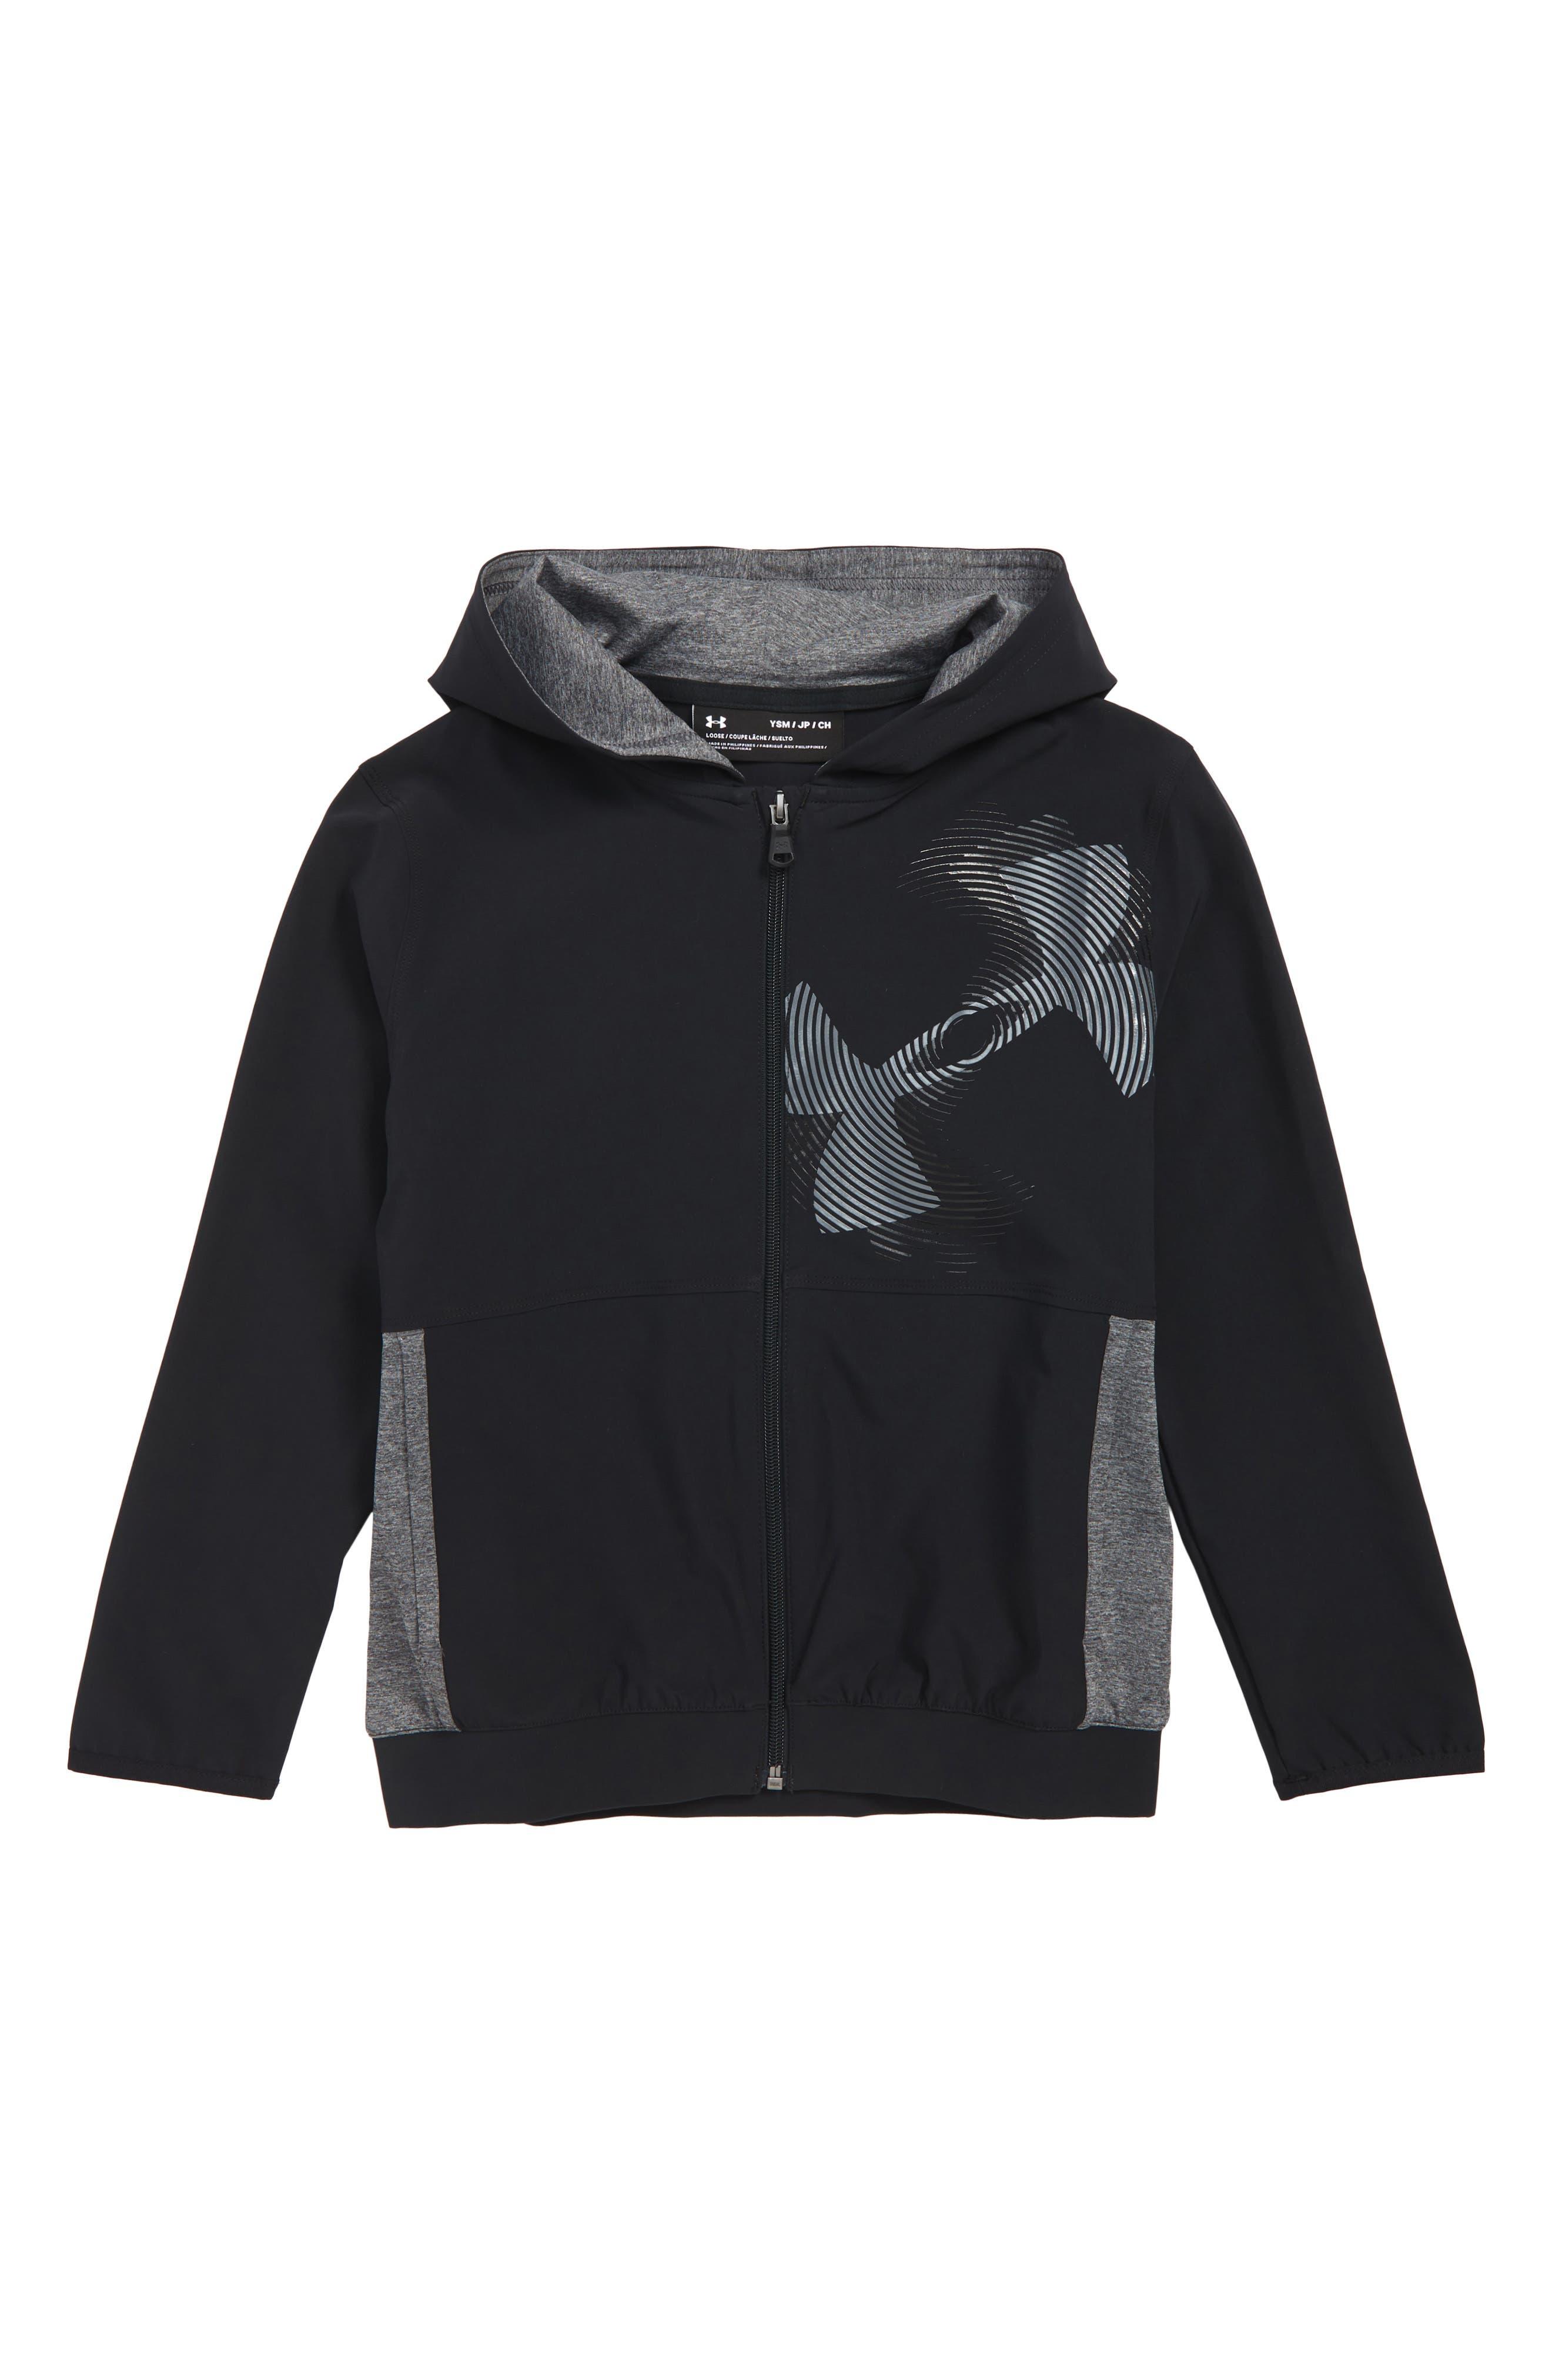 Woven Hooded Warm-Up Jacket, Main, color, BLACK / BLACK